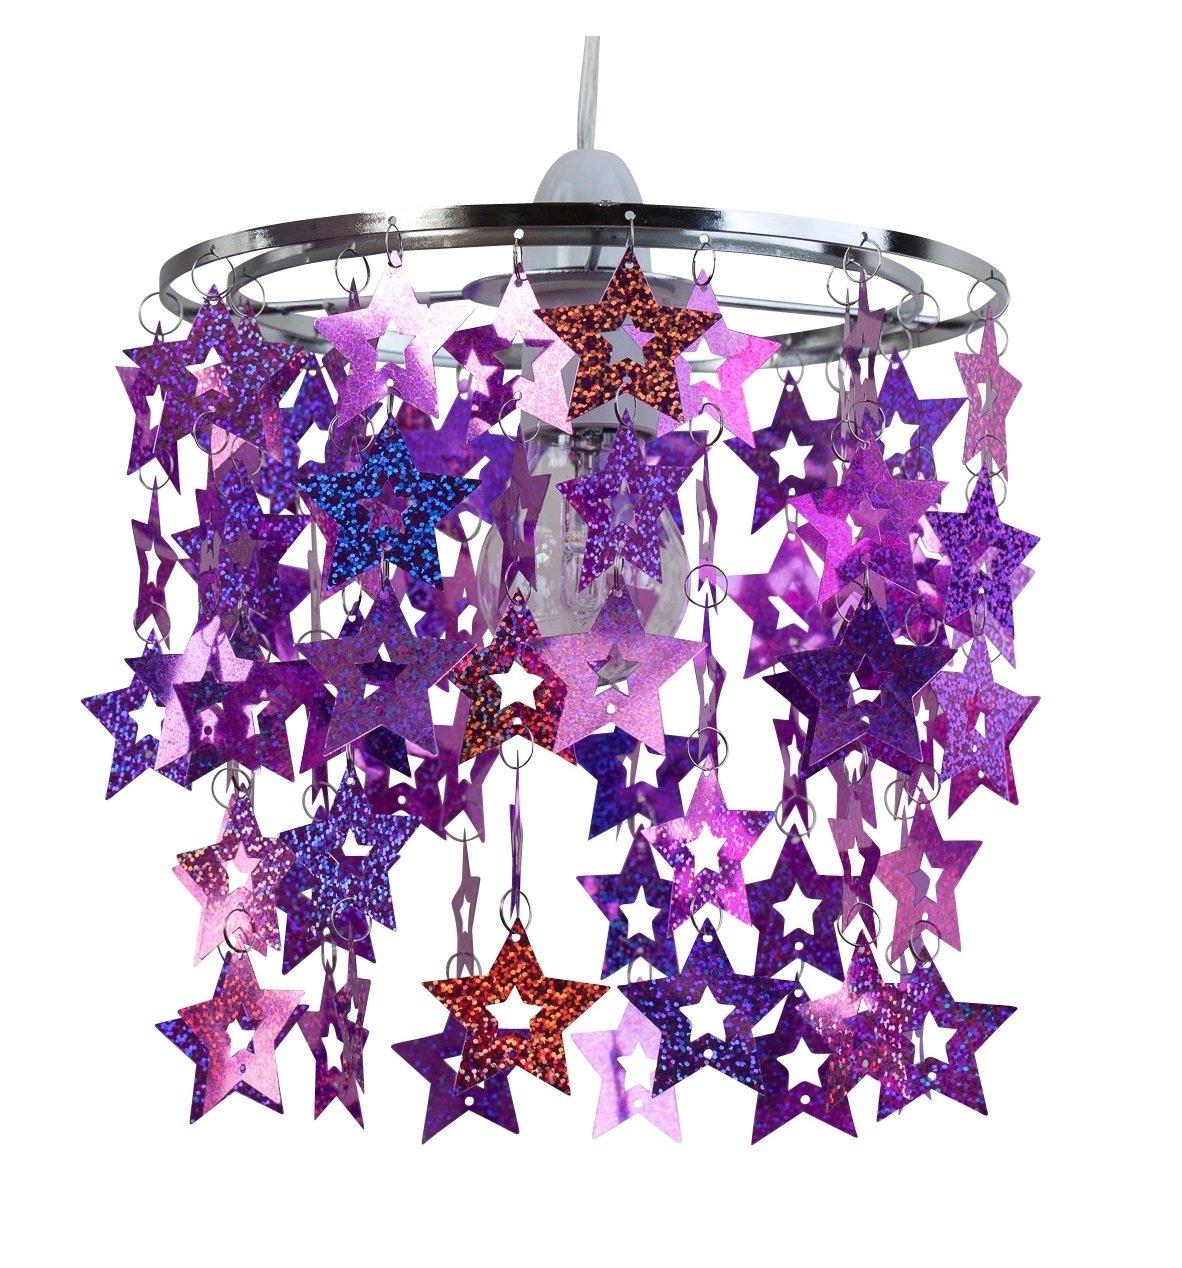 Girls Bedroom Nursery Pink Purple Sparkly Star Ceiling ...